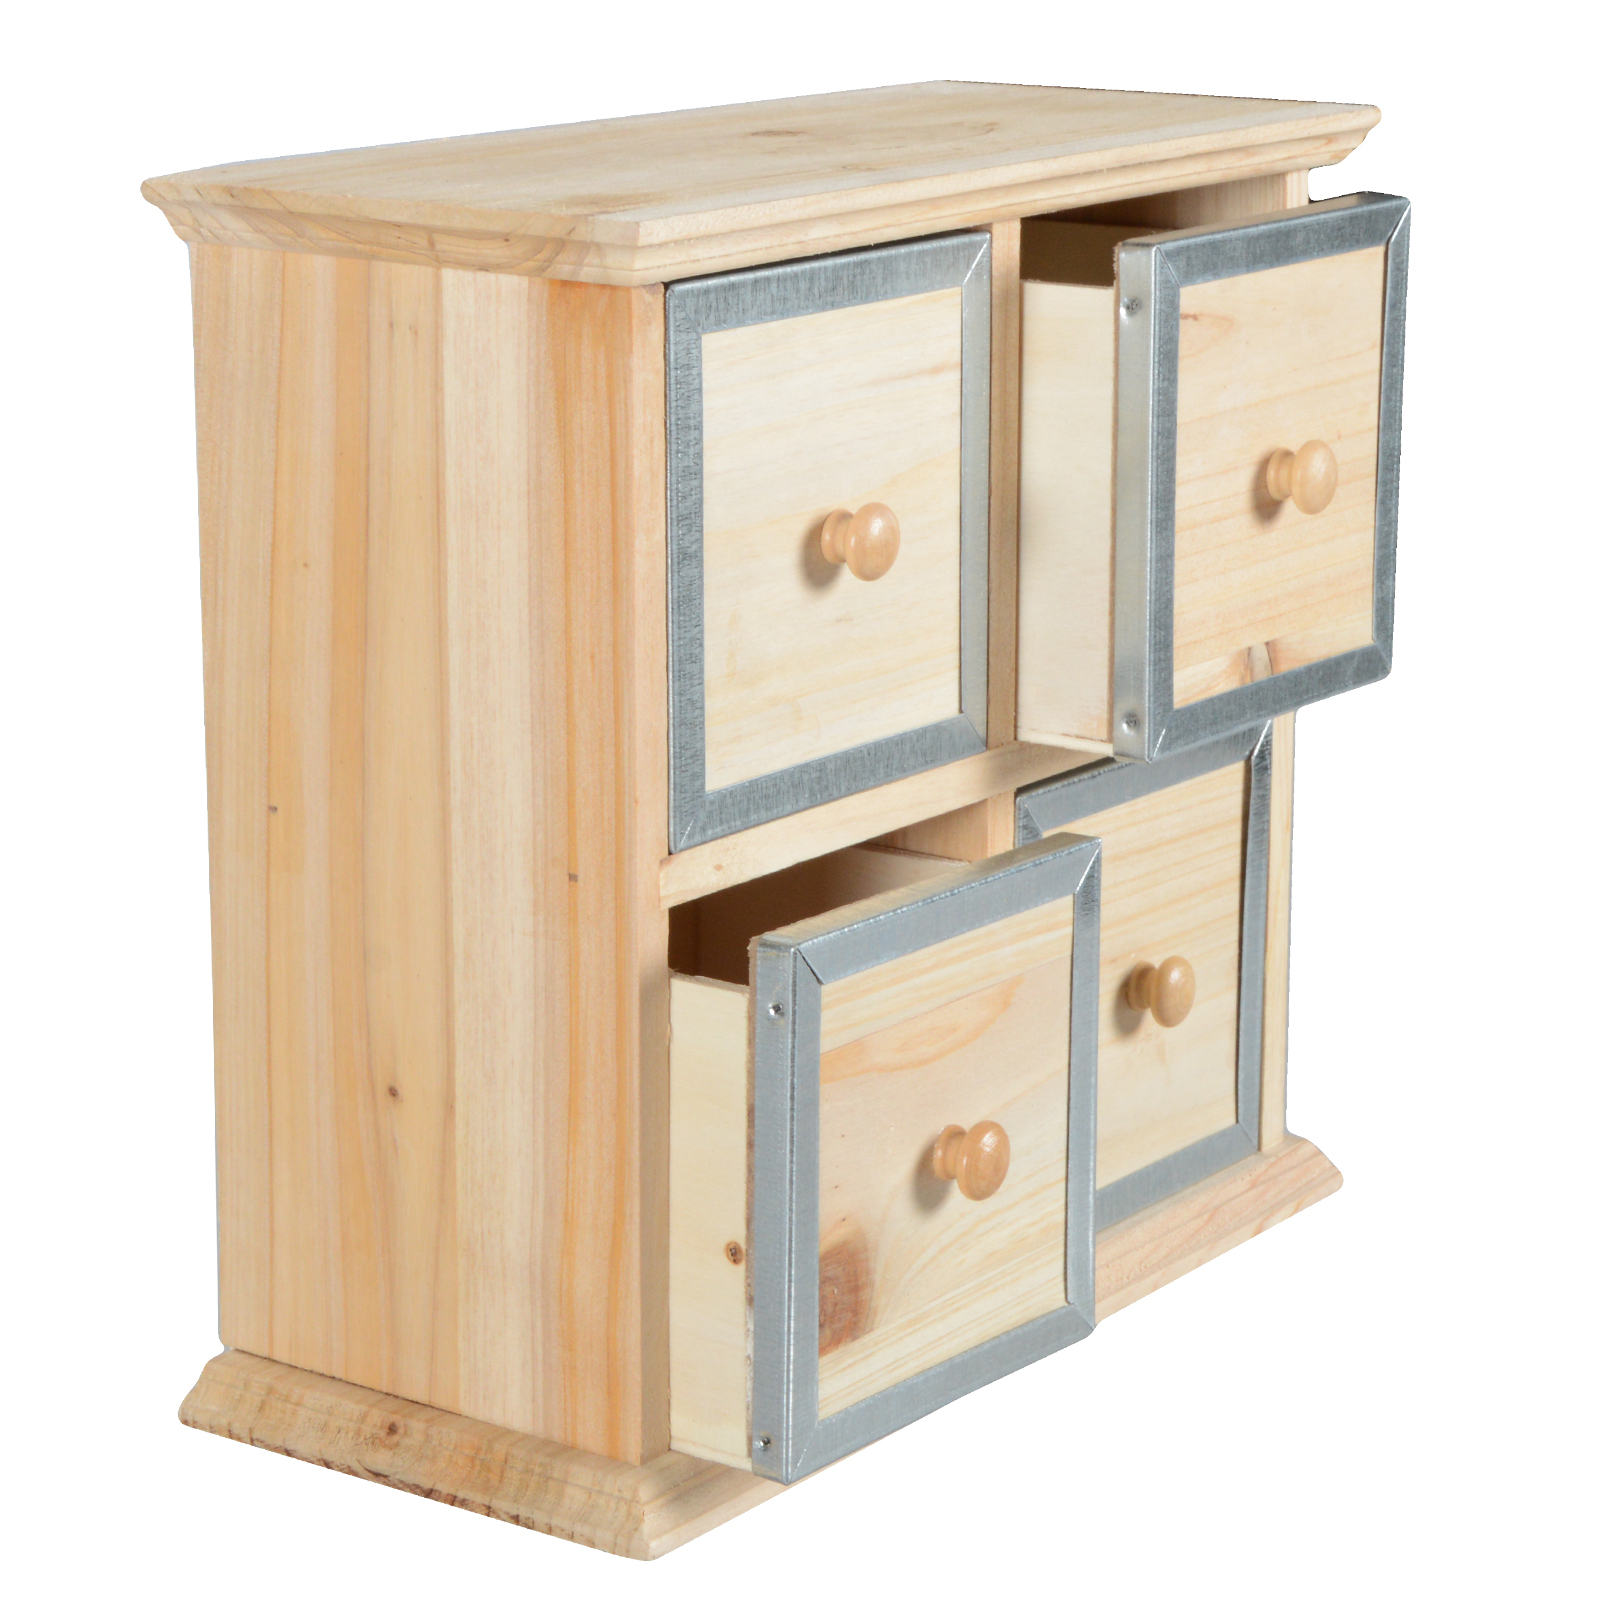 mini kommode kommode metall schrank naturholz shabby chic aufbewahrung. Black Bedroom Furniture Sets. Home Design Ideas